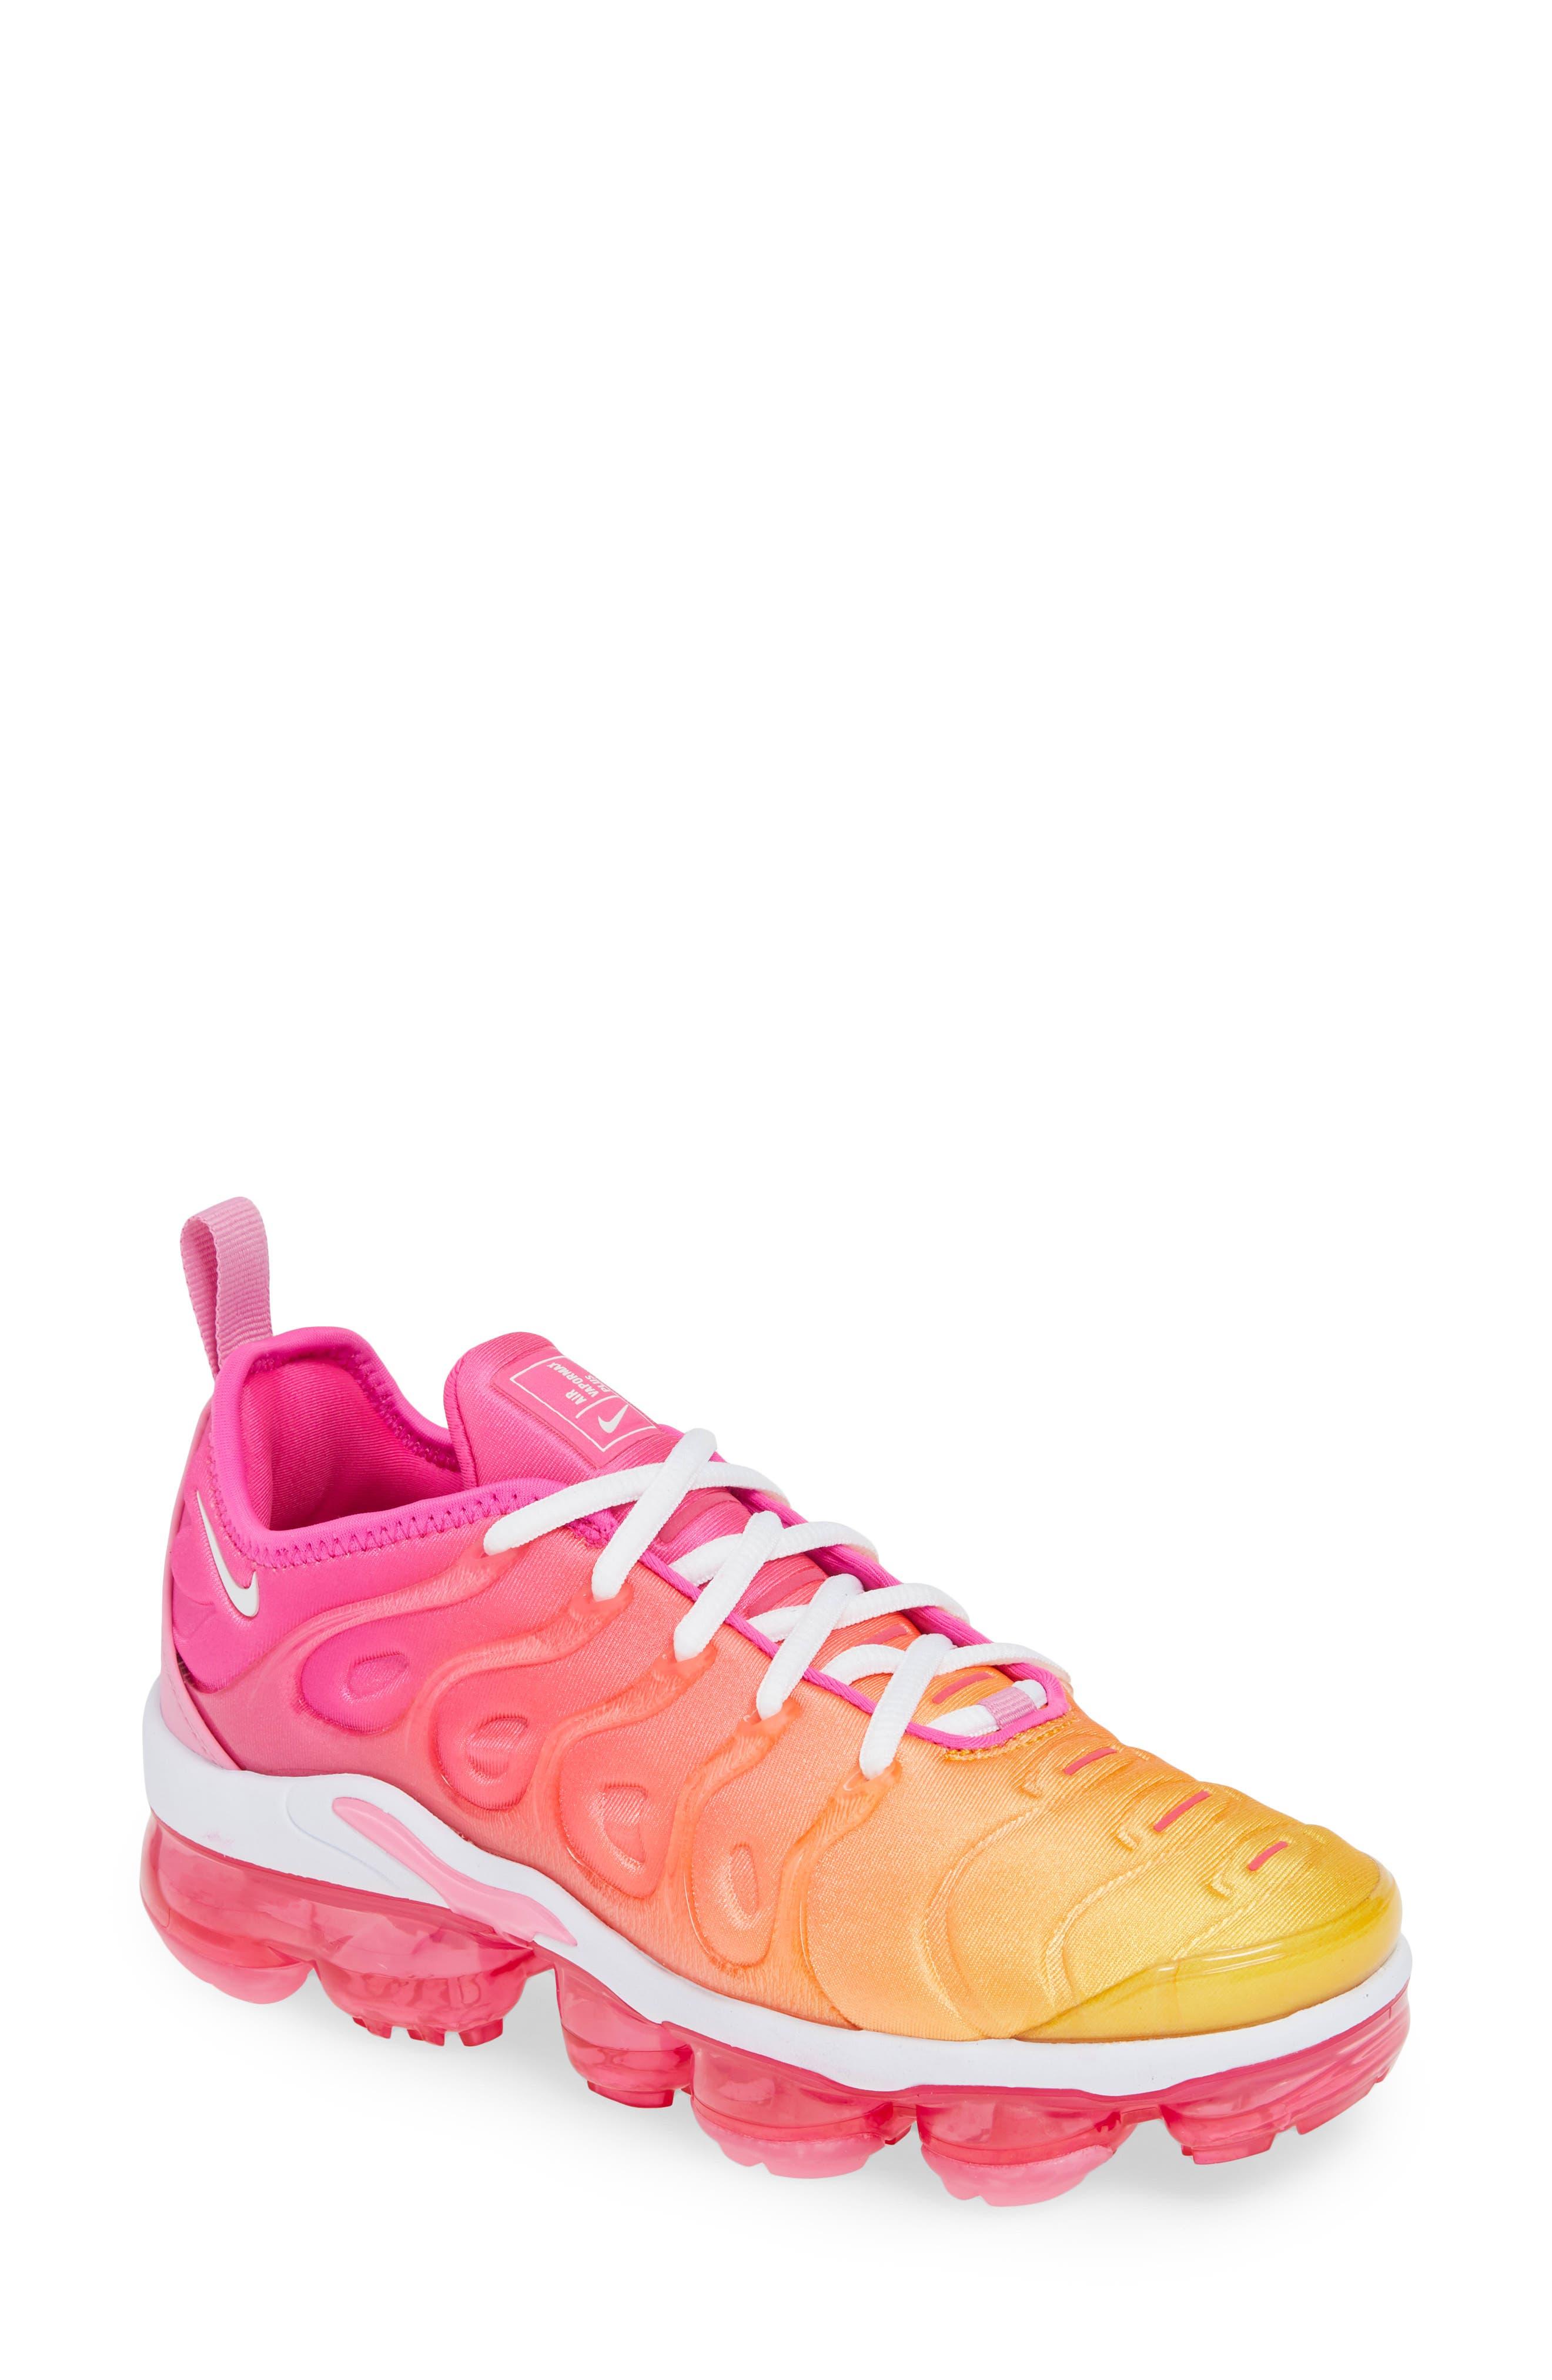 best sneakers de699 9f9b6 Running Nike Shoes   Sneakers   Nordstrom